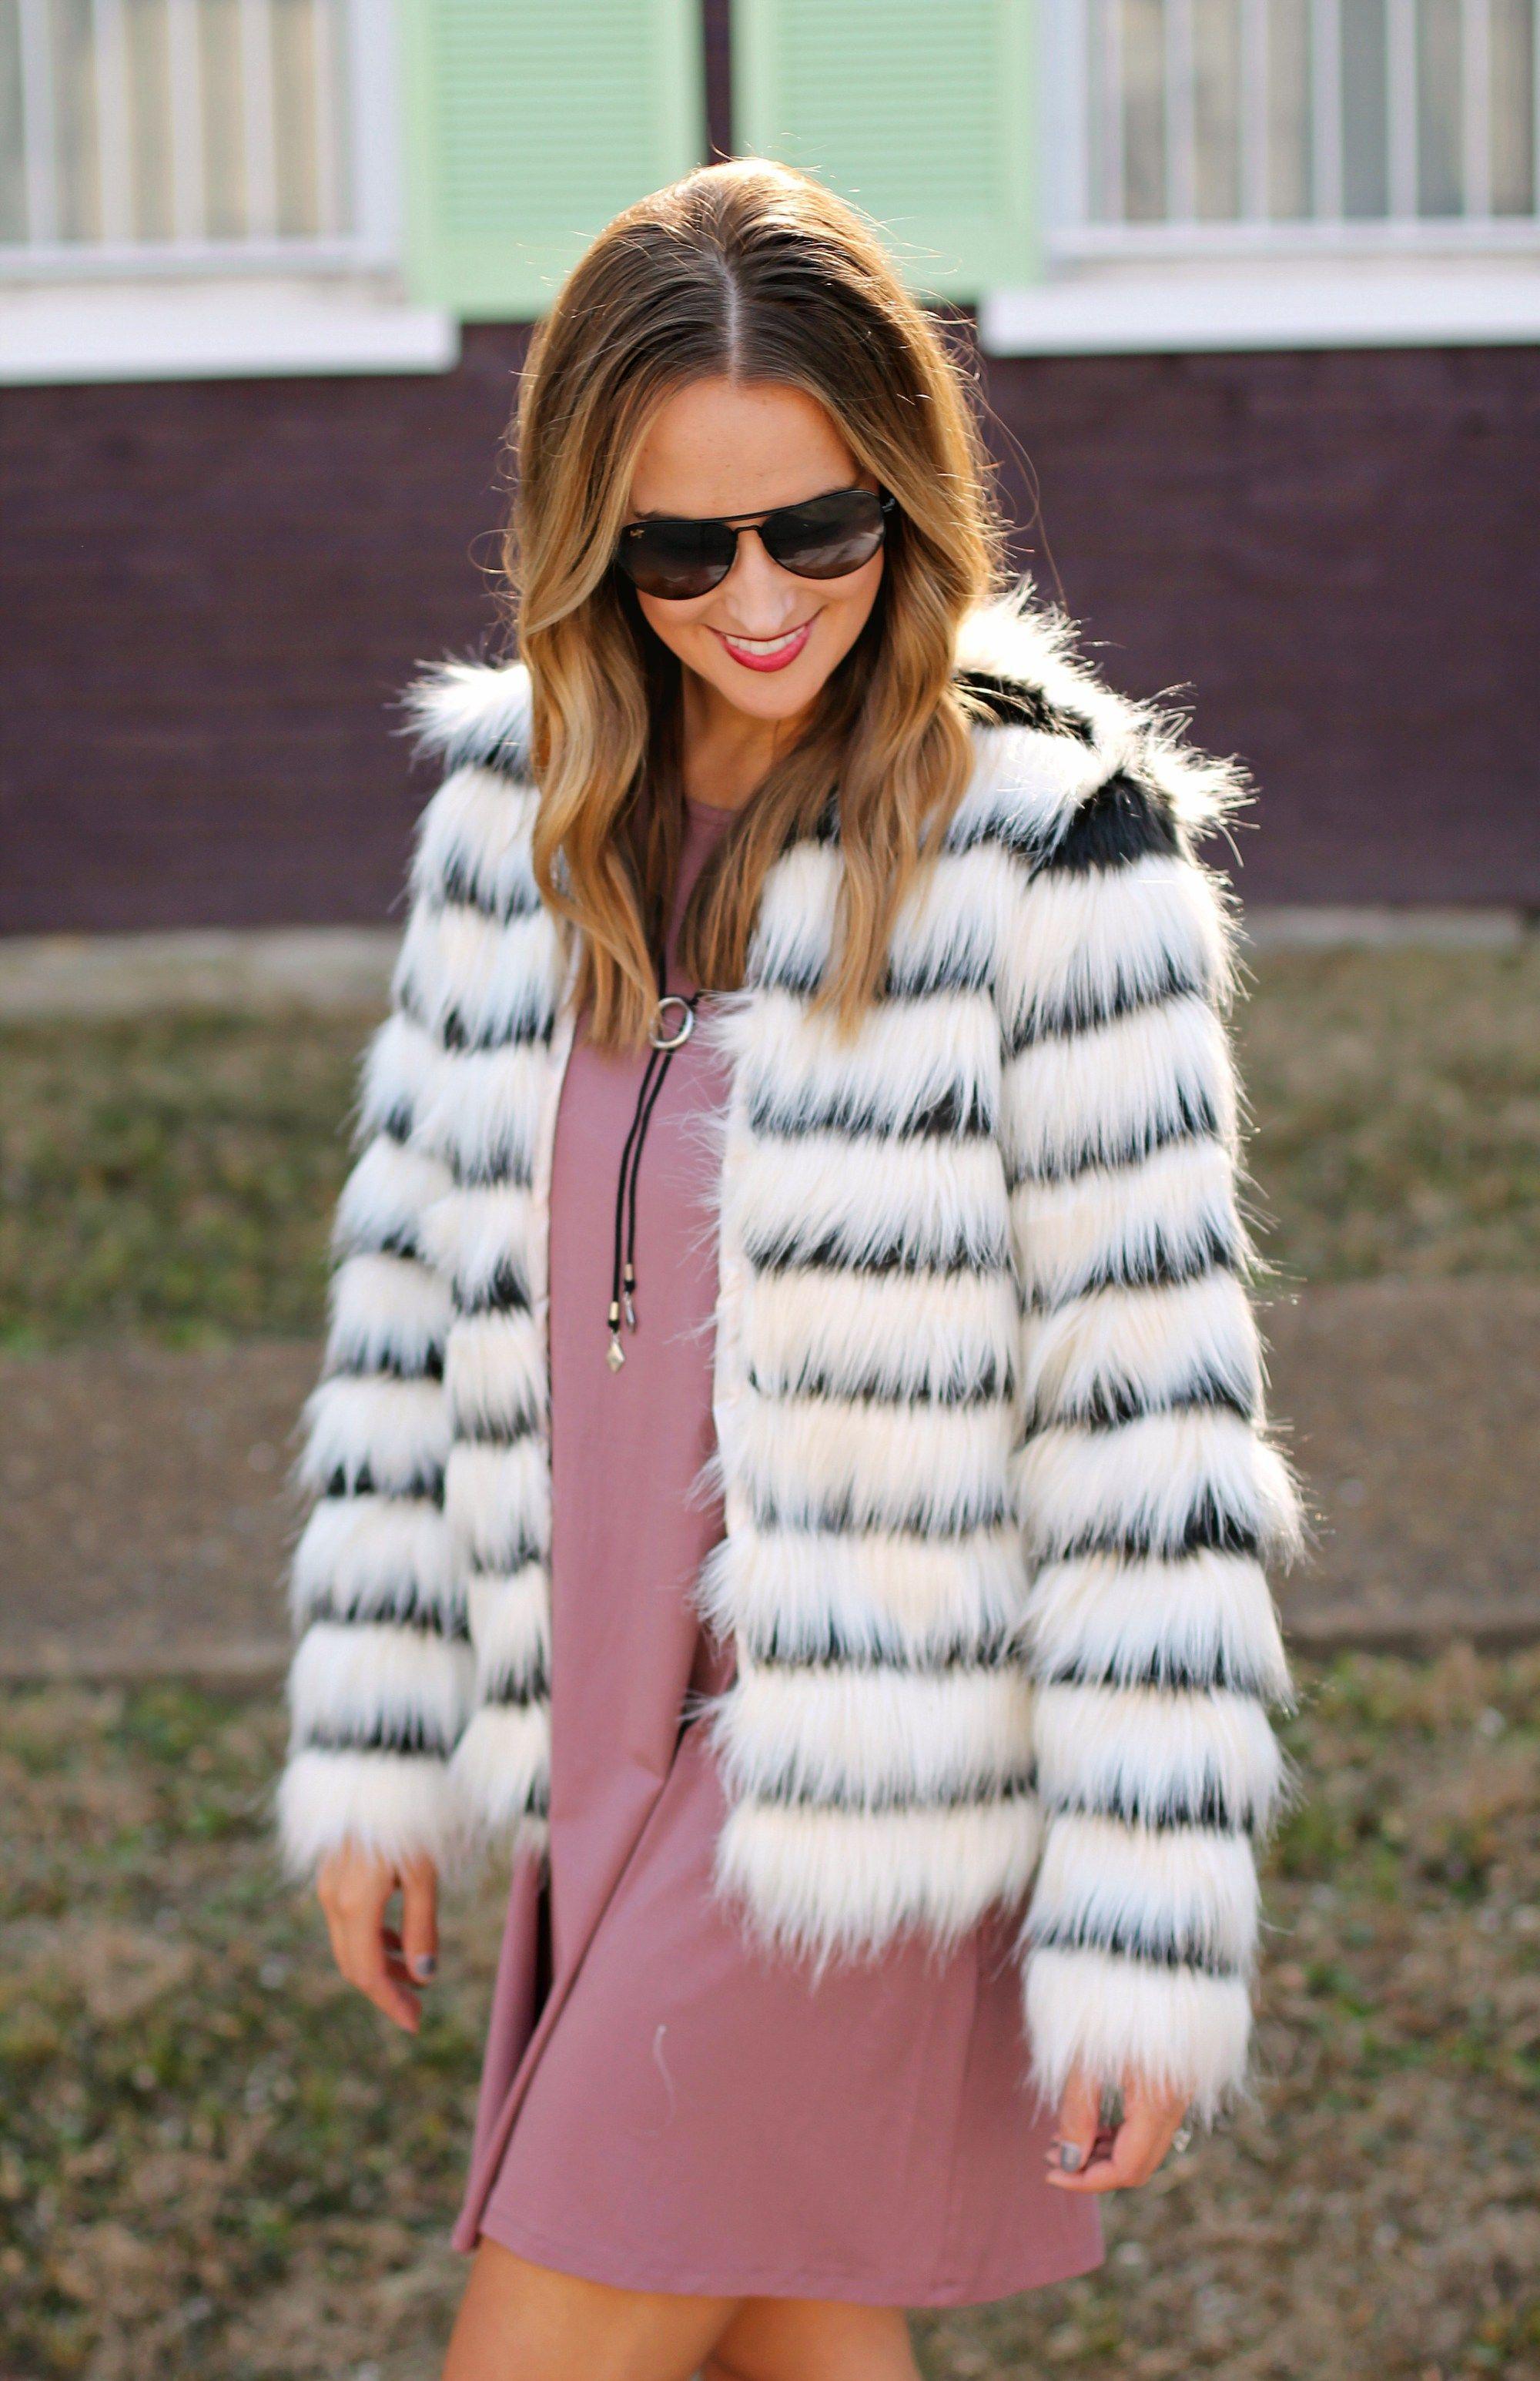 f8ba1268b155a Faux Fur For The Holidays  fallstyle  fallfashion  styleideas   styleinspiration  outfit  outfitideas  casualoutfit  falloutfit   fashionblogger  styleblogger ...